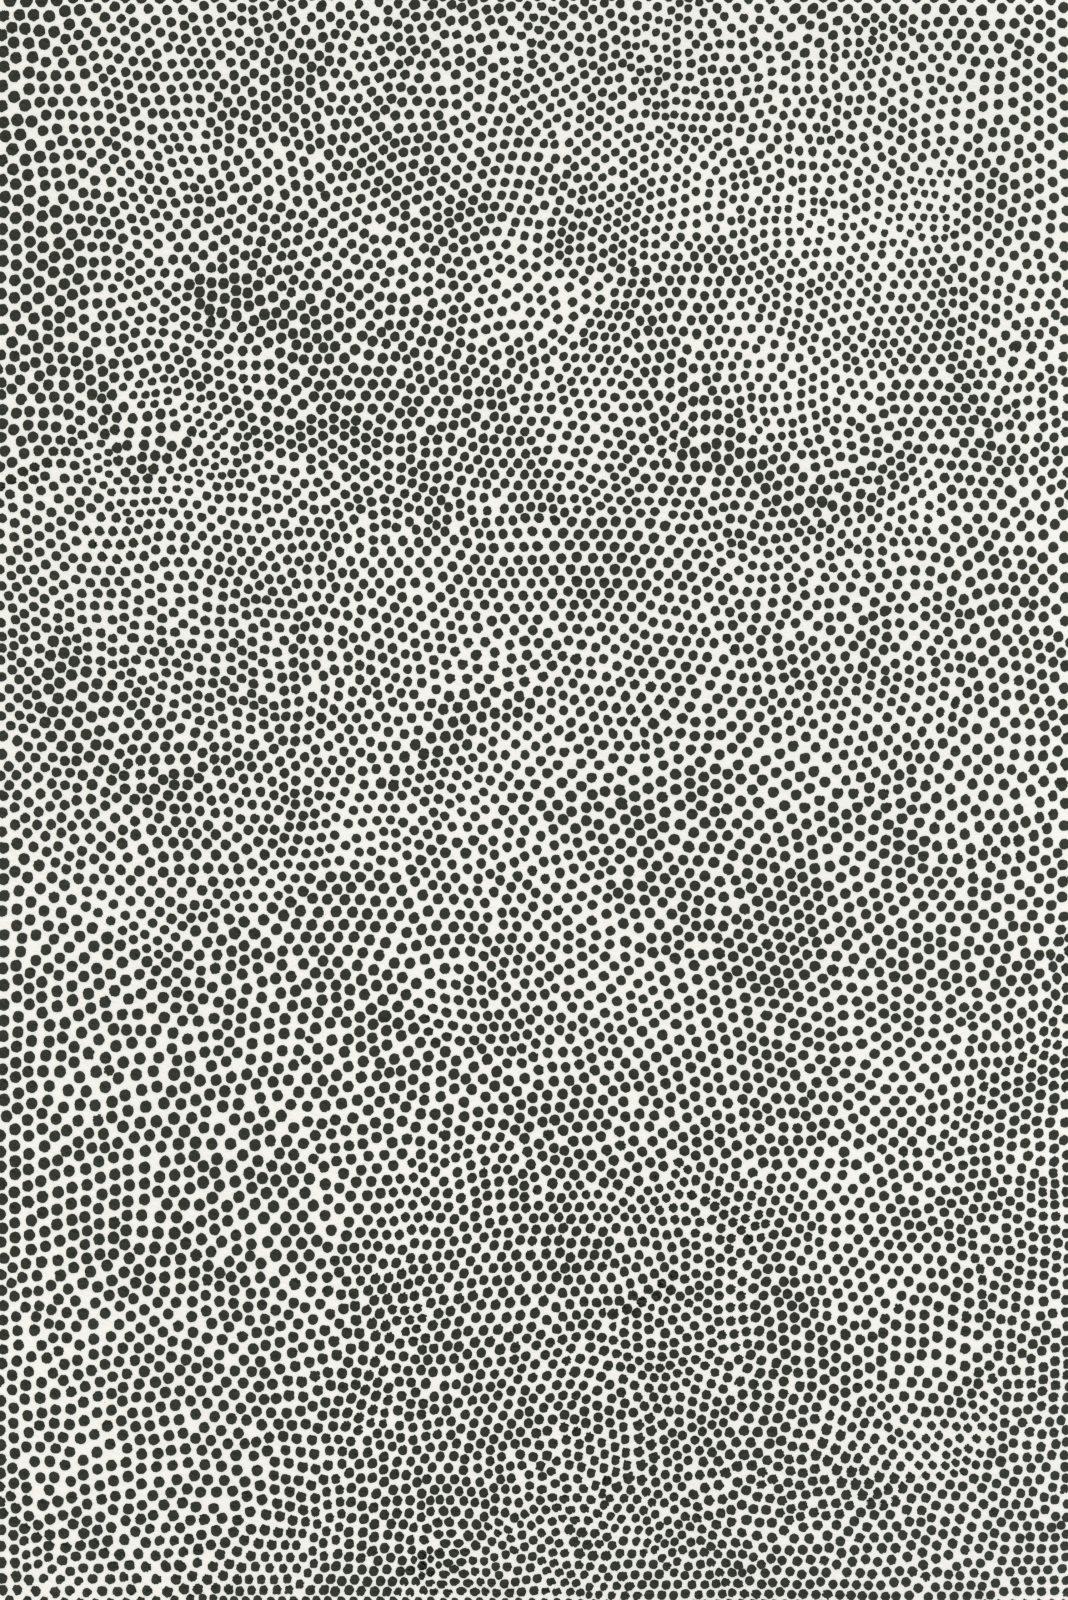 NÖ Waldviertel Galerie Kunst - Max Appel-Palma